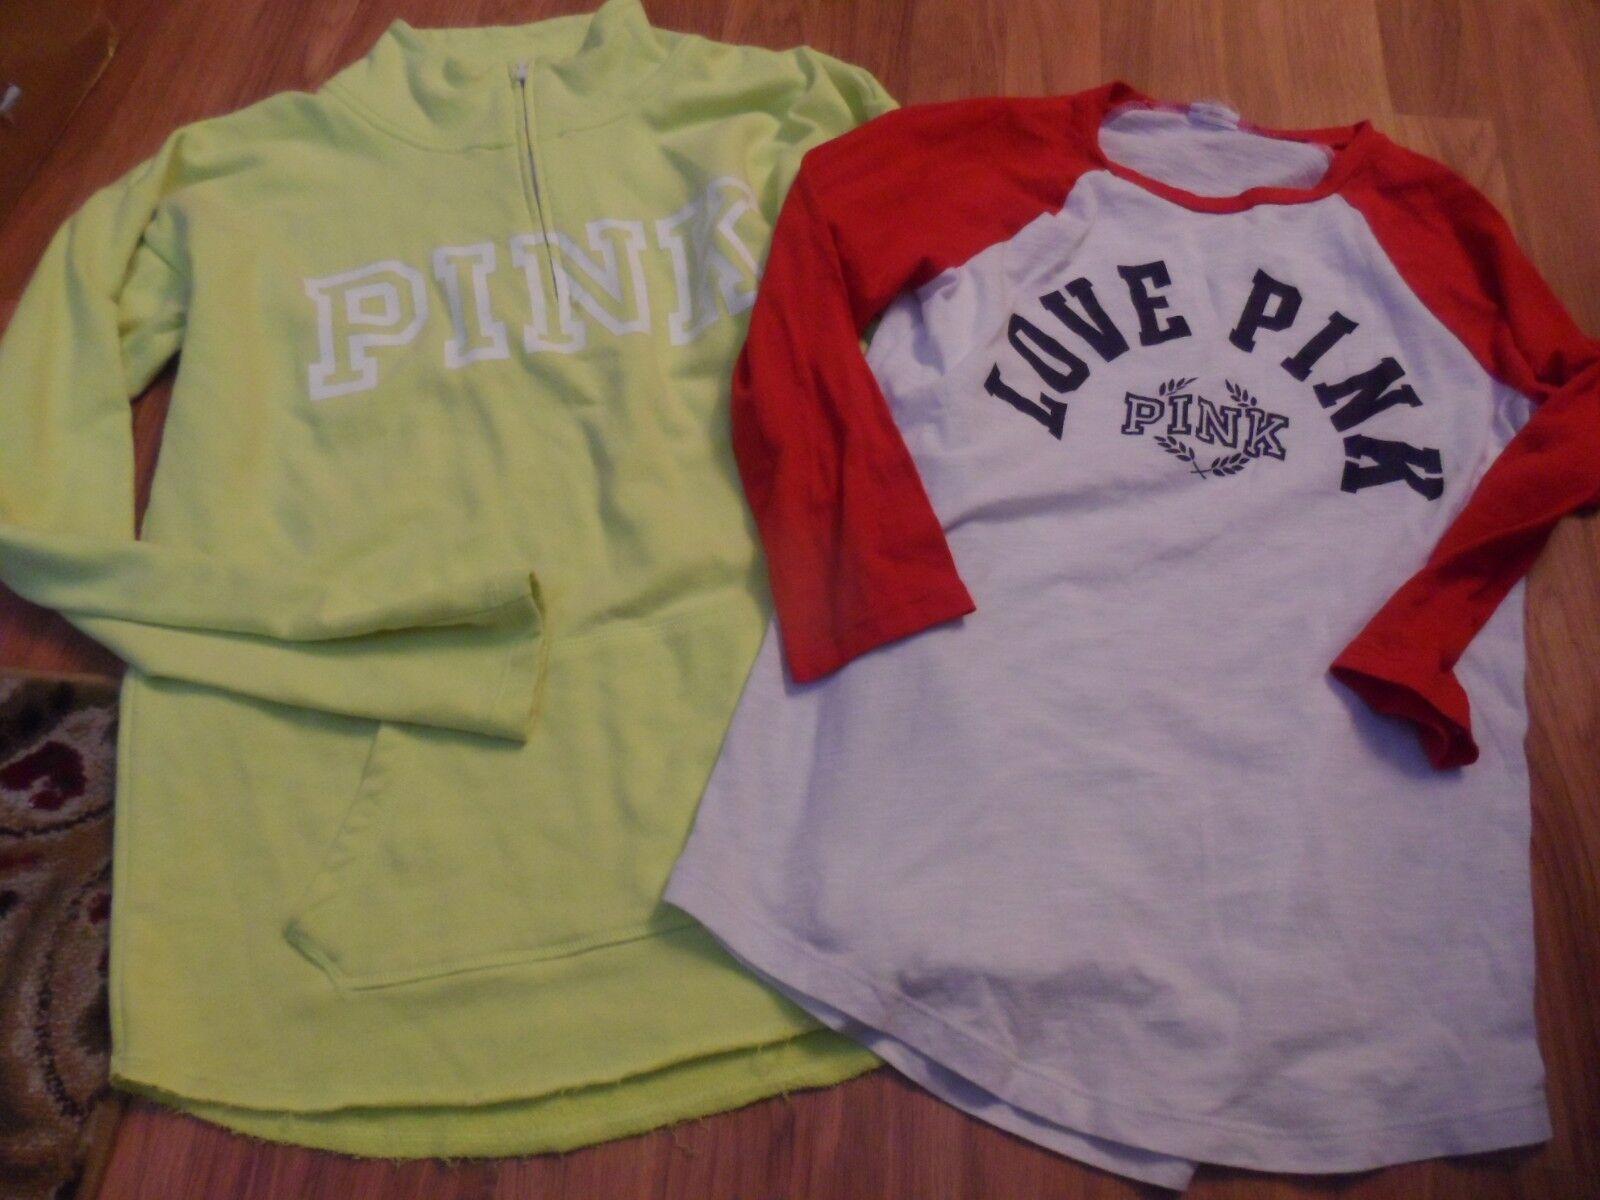 VS Victoria's secret PINK  small  baseball t-shirt shirt top & sweatshirt